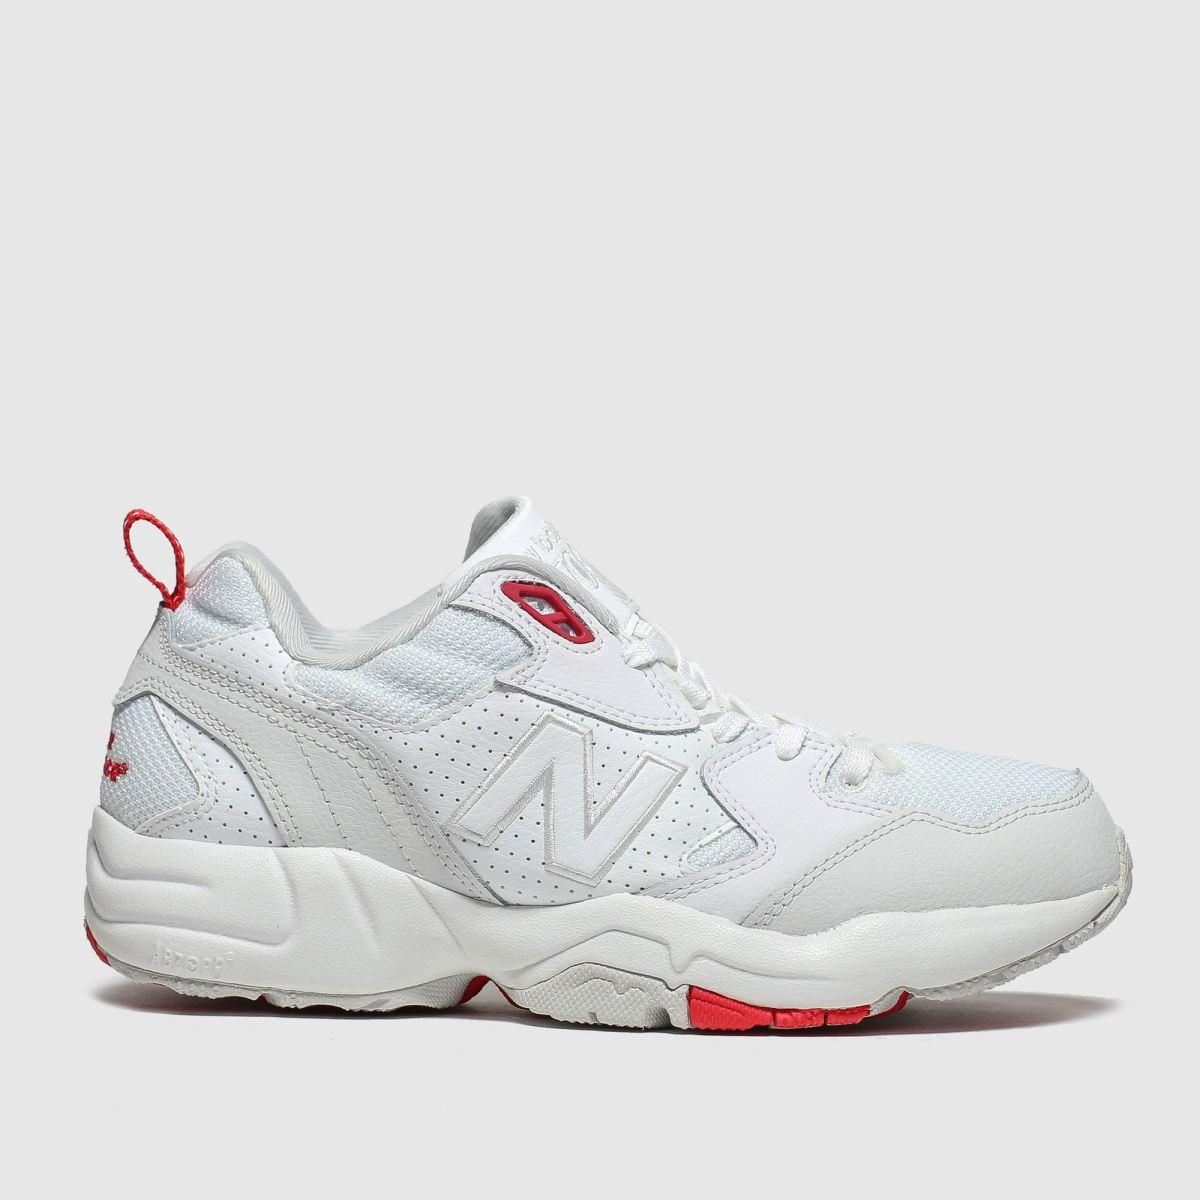 New Balance New Balance White & Red 708 Trainers